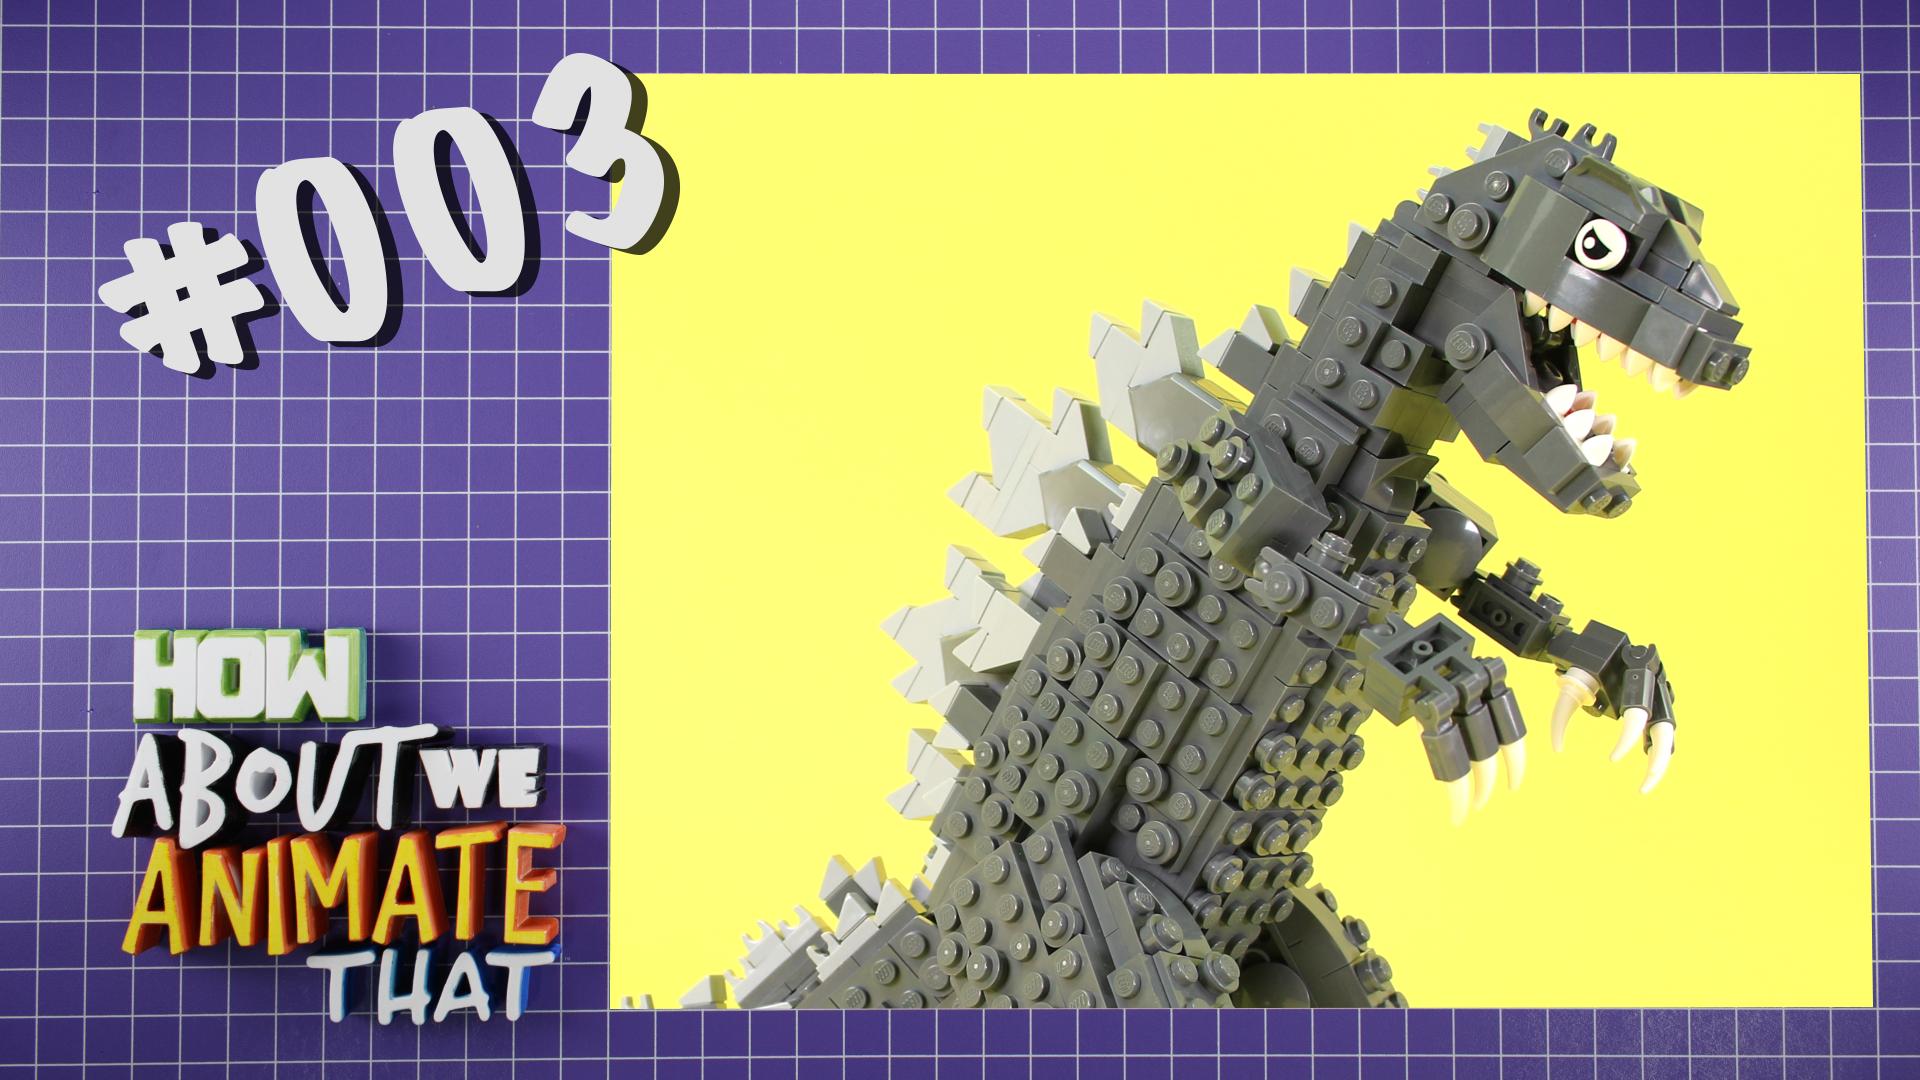 HAWAT: BRICK 101 LEGO Godzilla